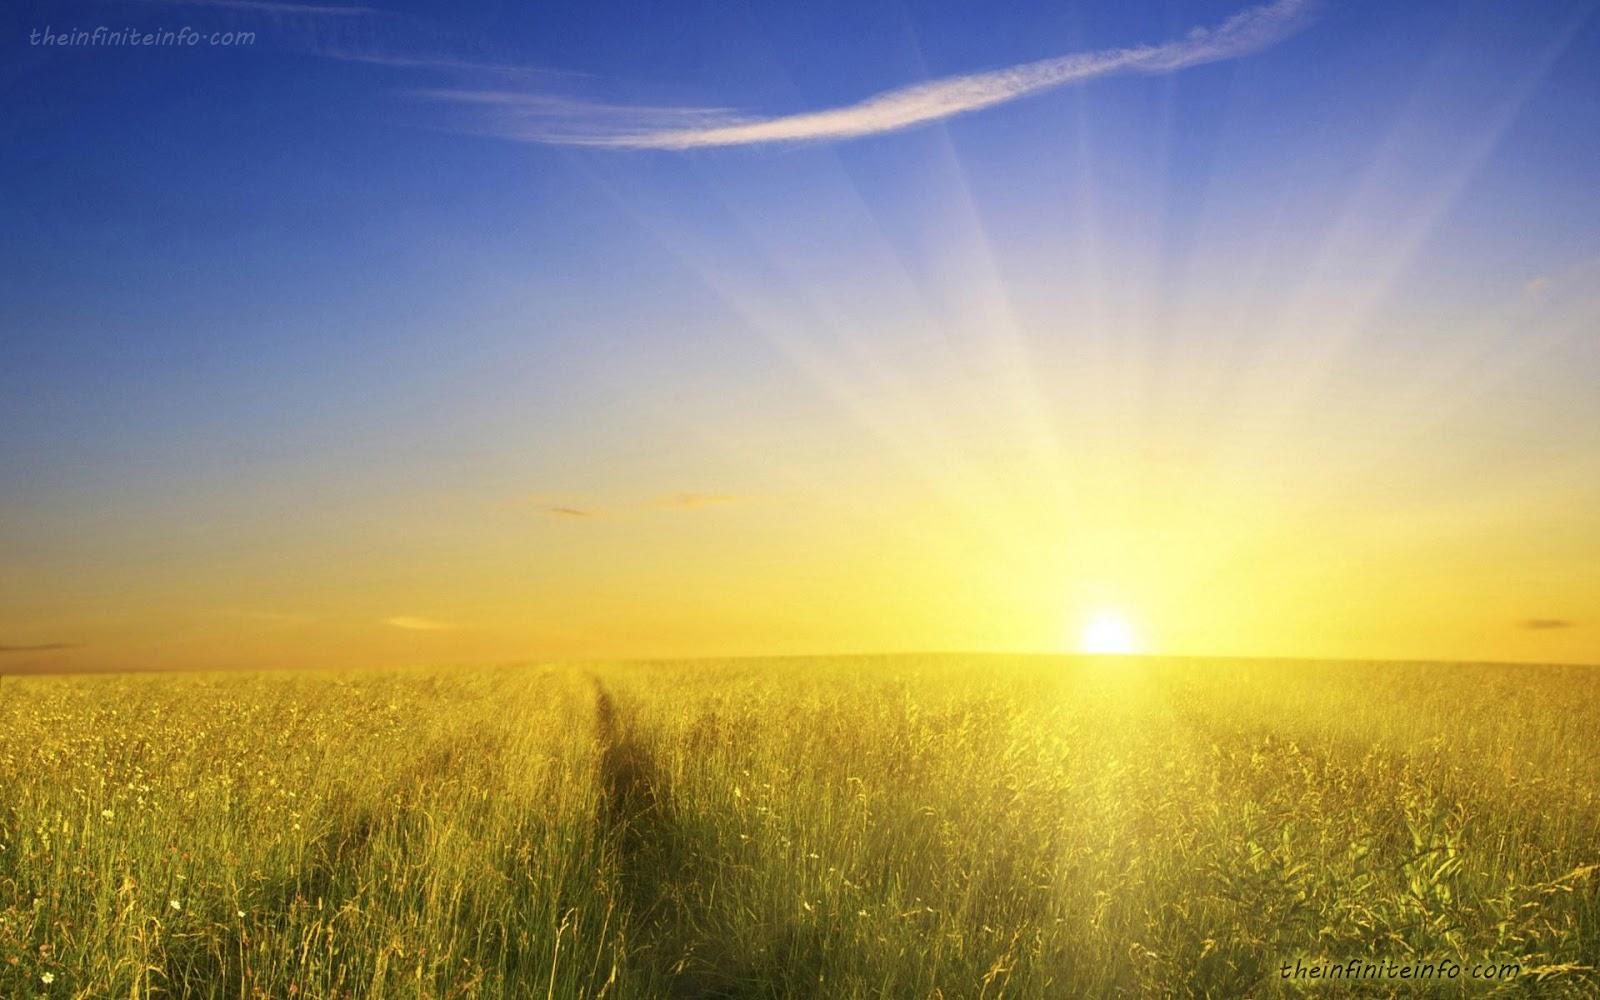 Wallpaper: A Cup Of Sunshine Wallpaper